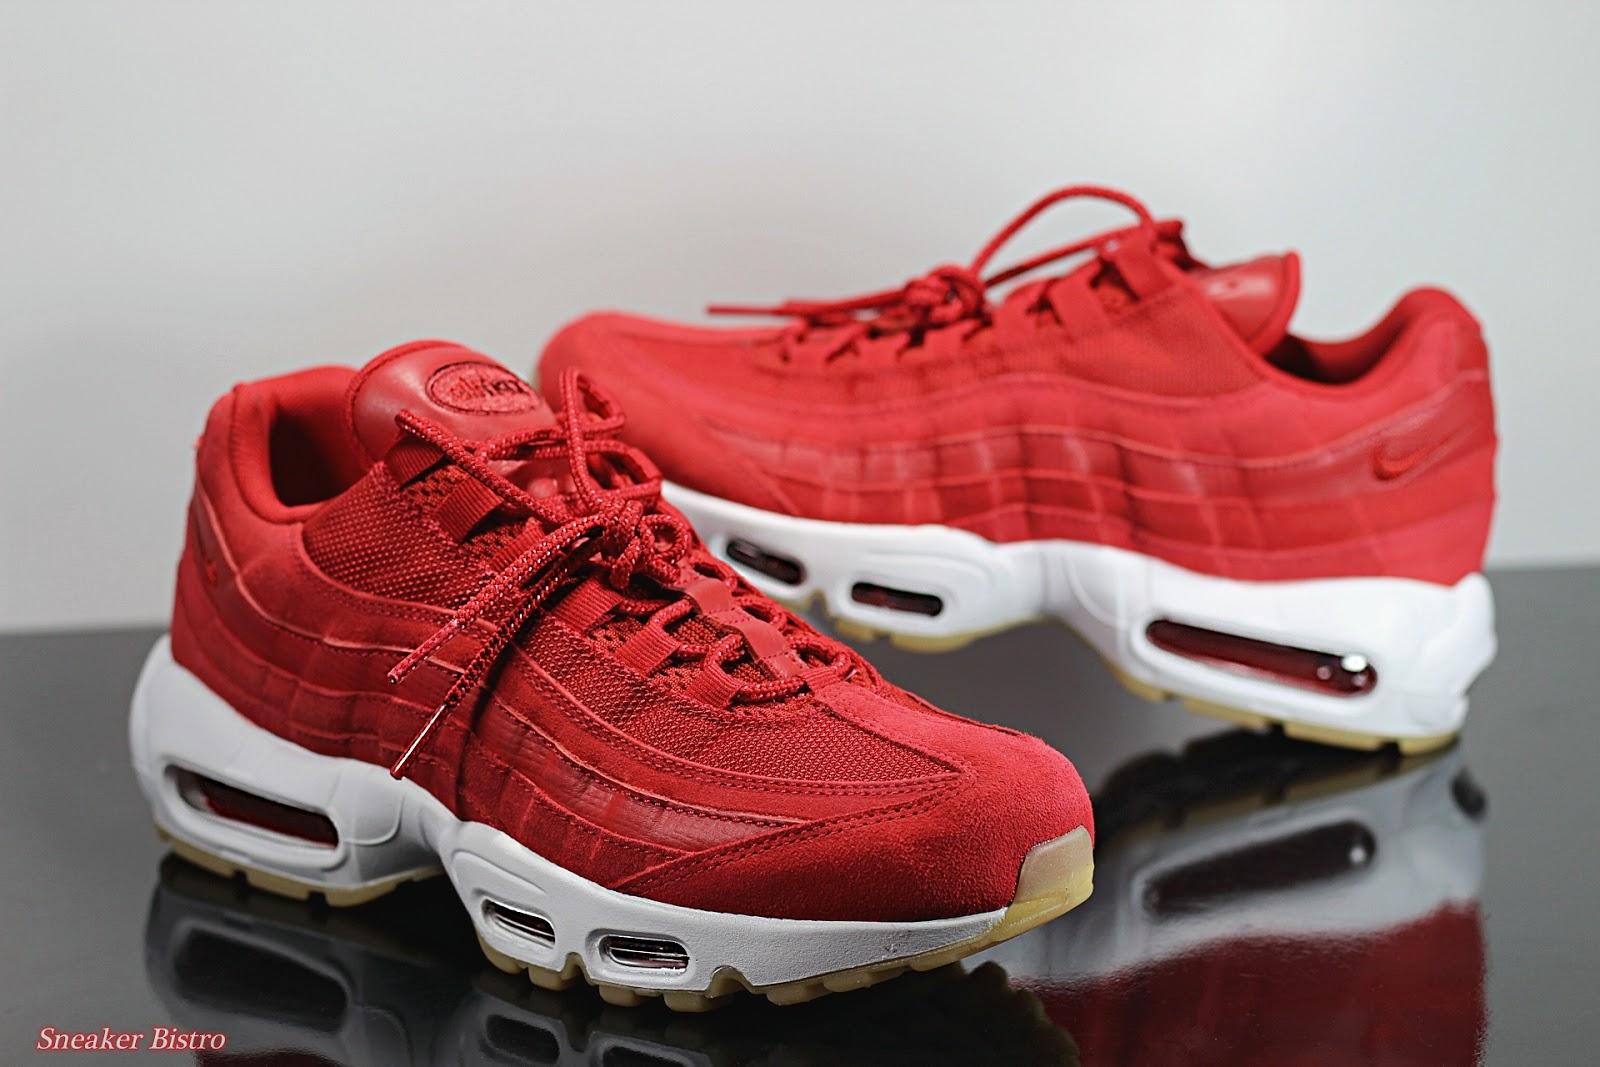 reputable site ae467 5affd Nike Air Max 95 Premium Gym Red